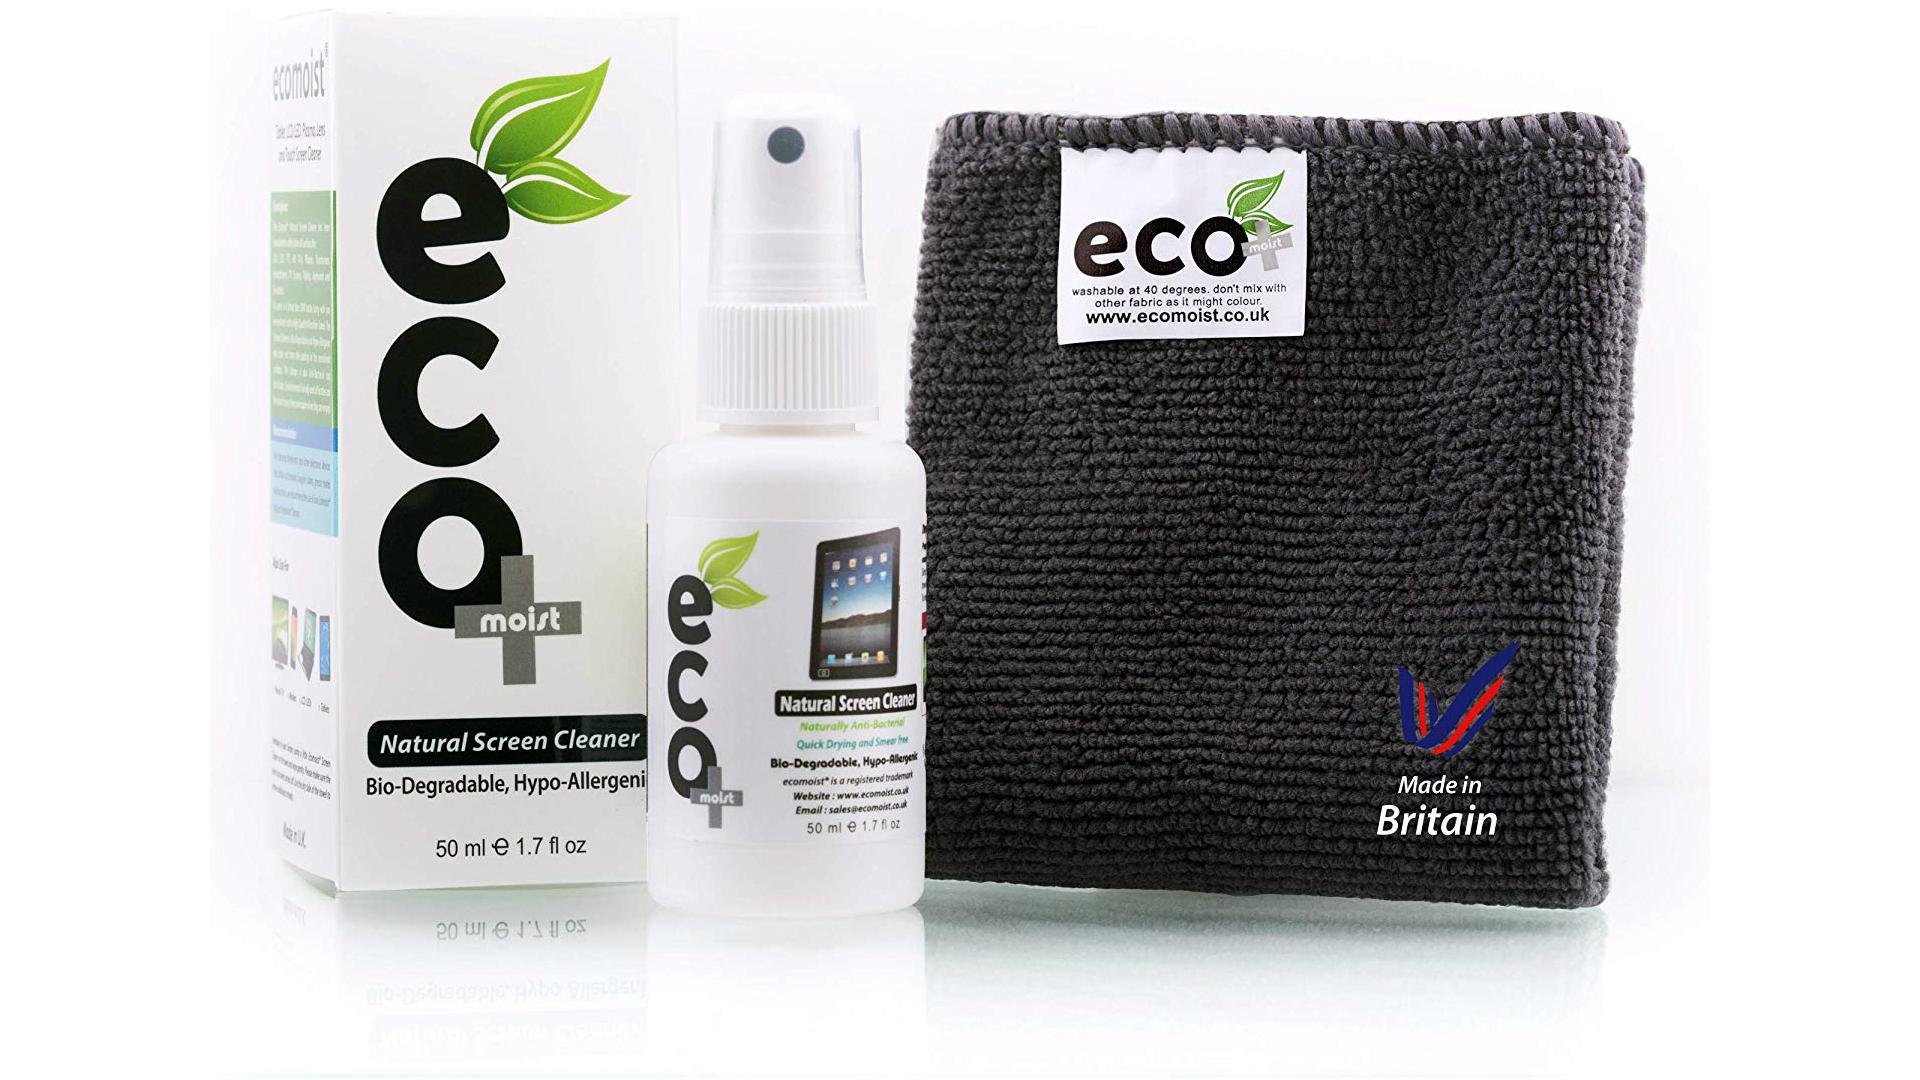 EcoMoist Natural Organic Screen Cleaner 2